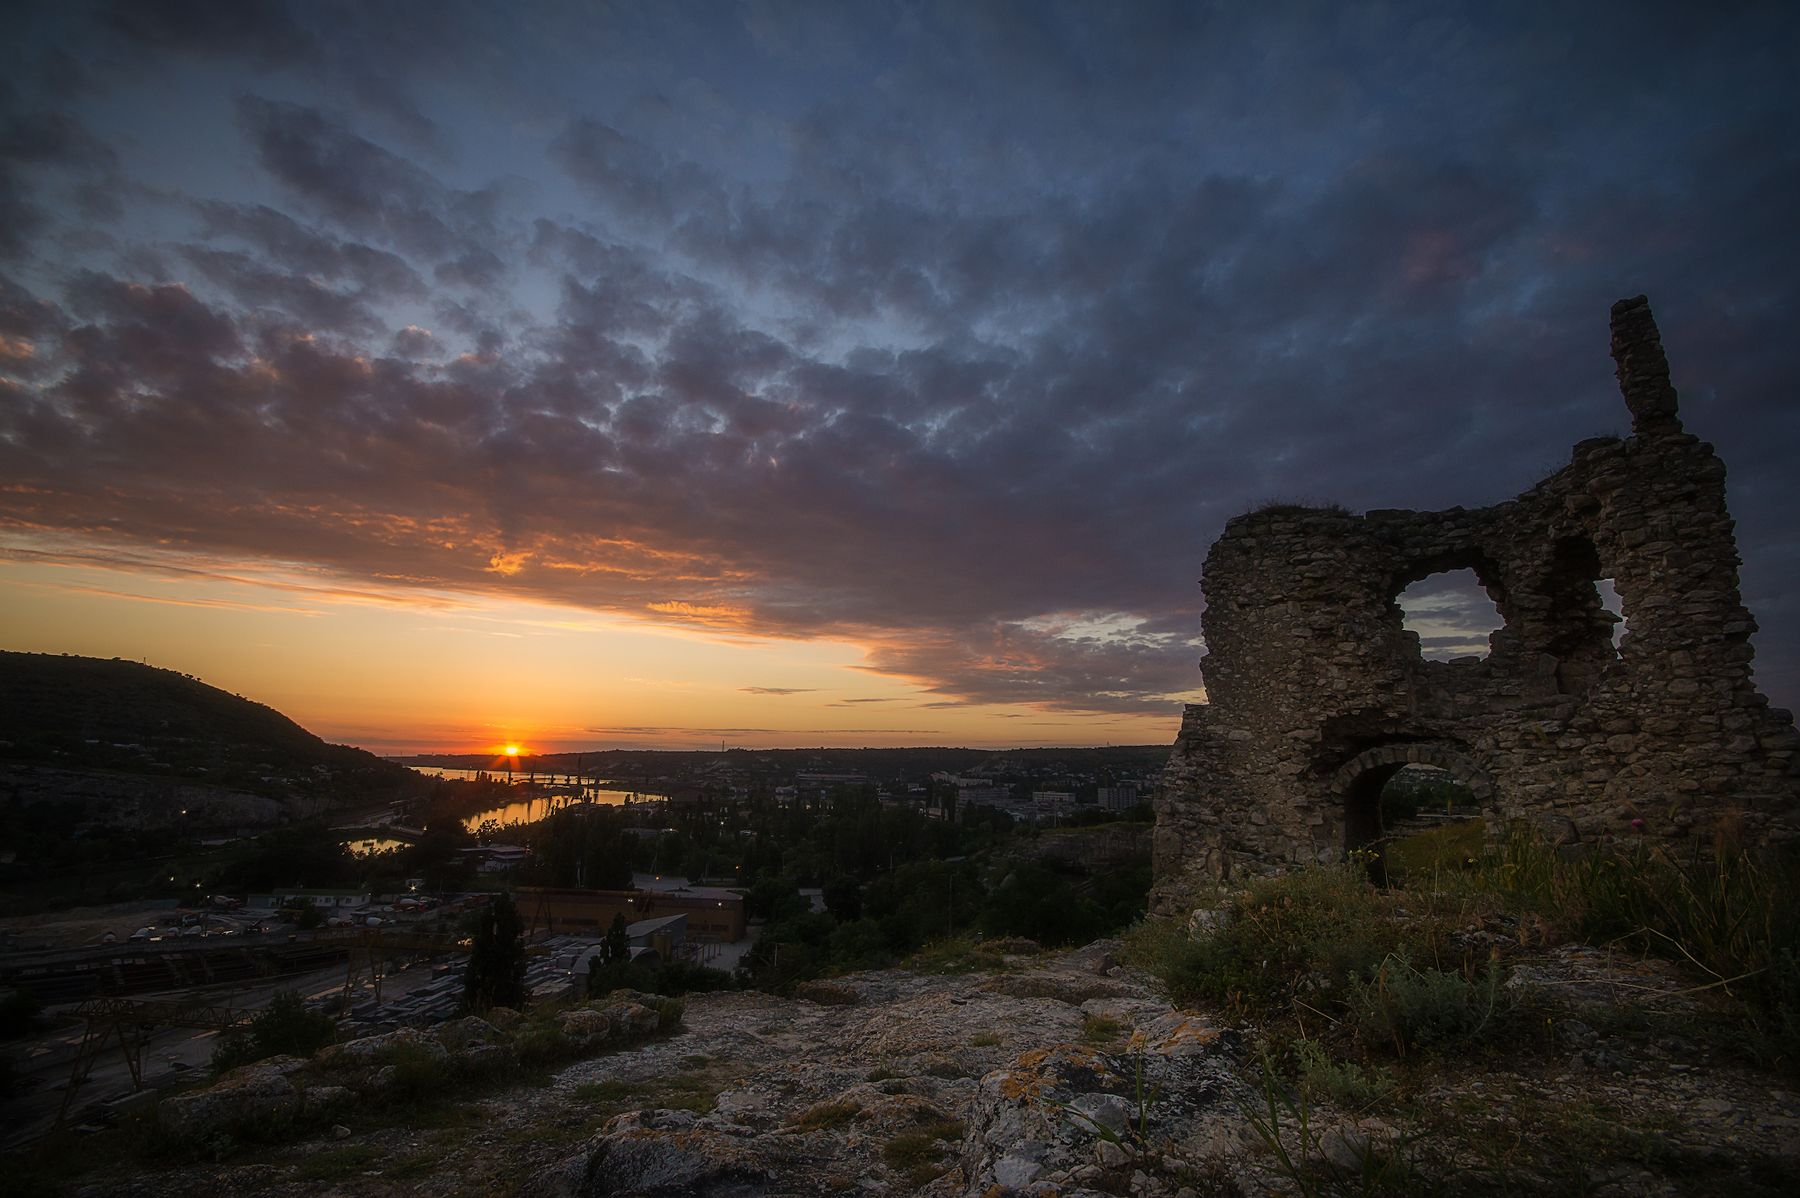 Инкерман, Каламита 2 Крым пейзаж закат